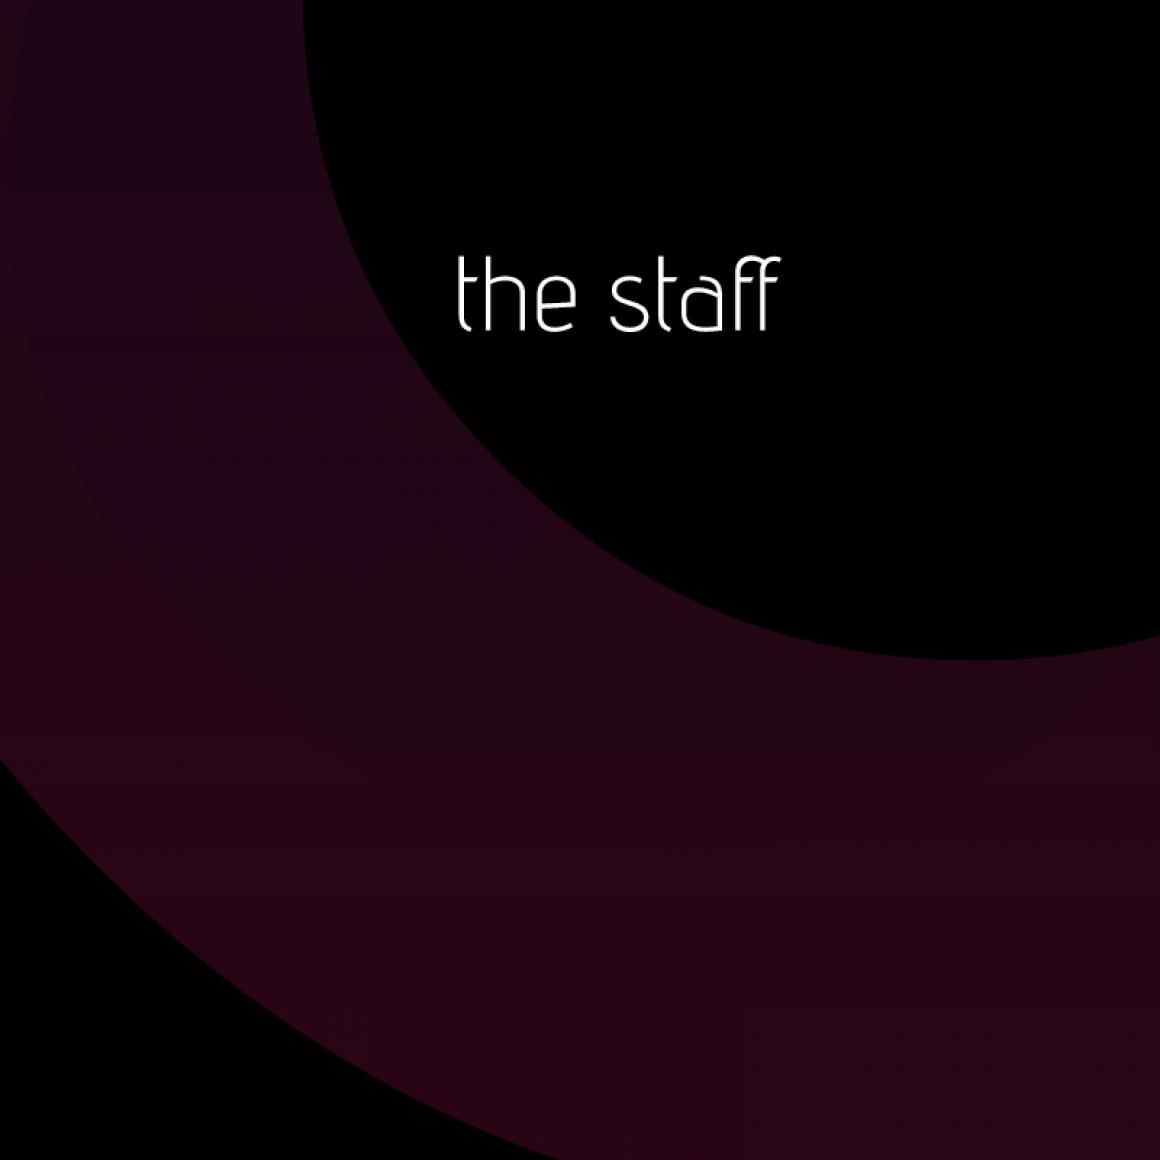 theStaff_04